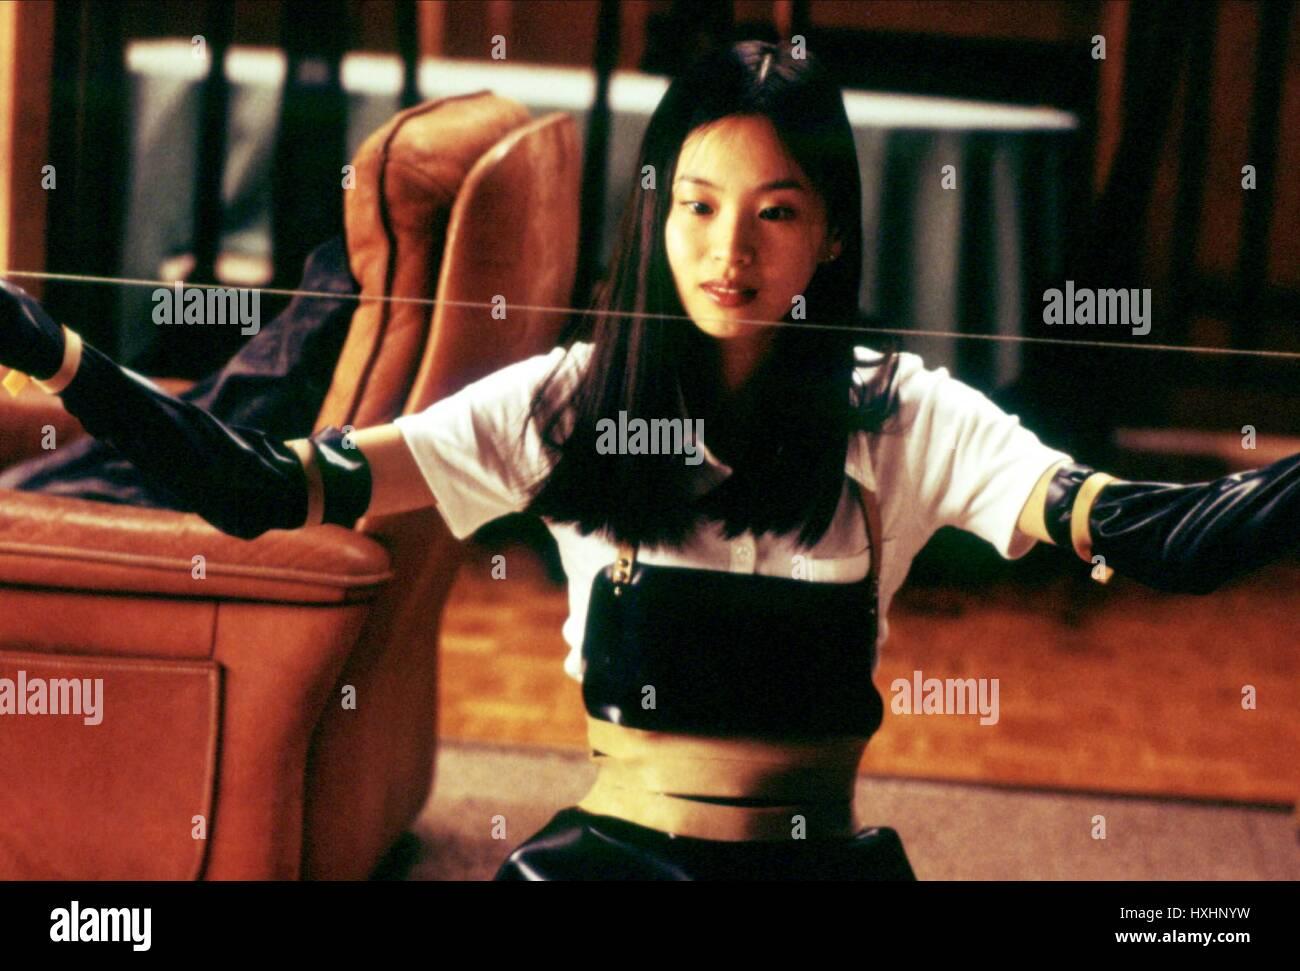 Eihi Shiina Eihi Shiina new pictures